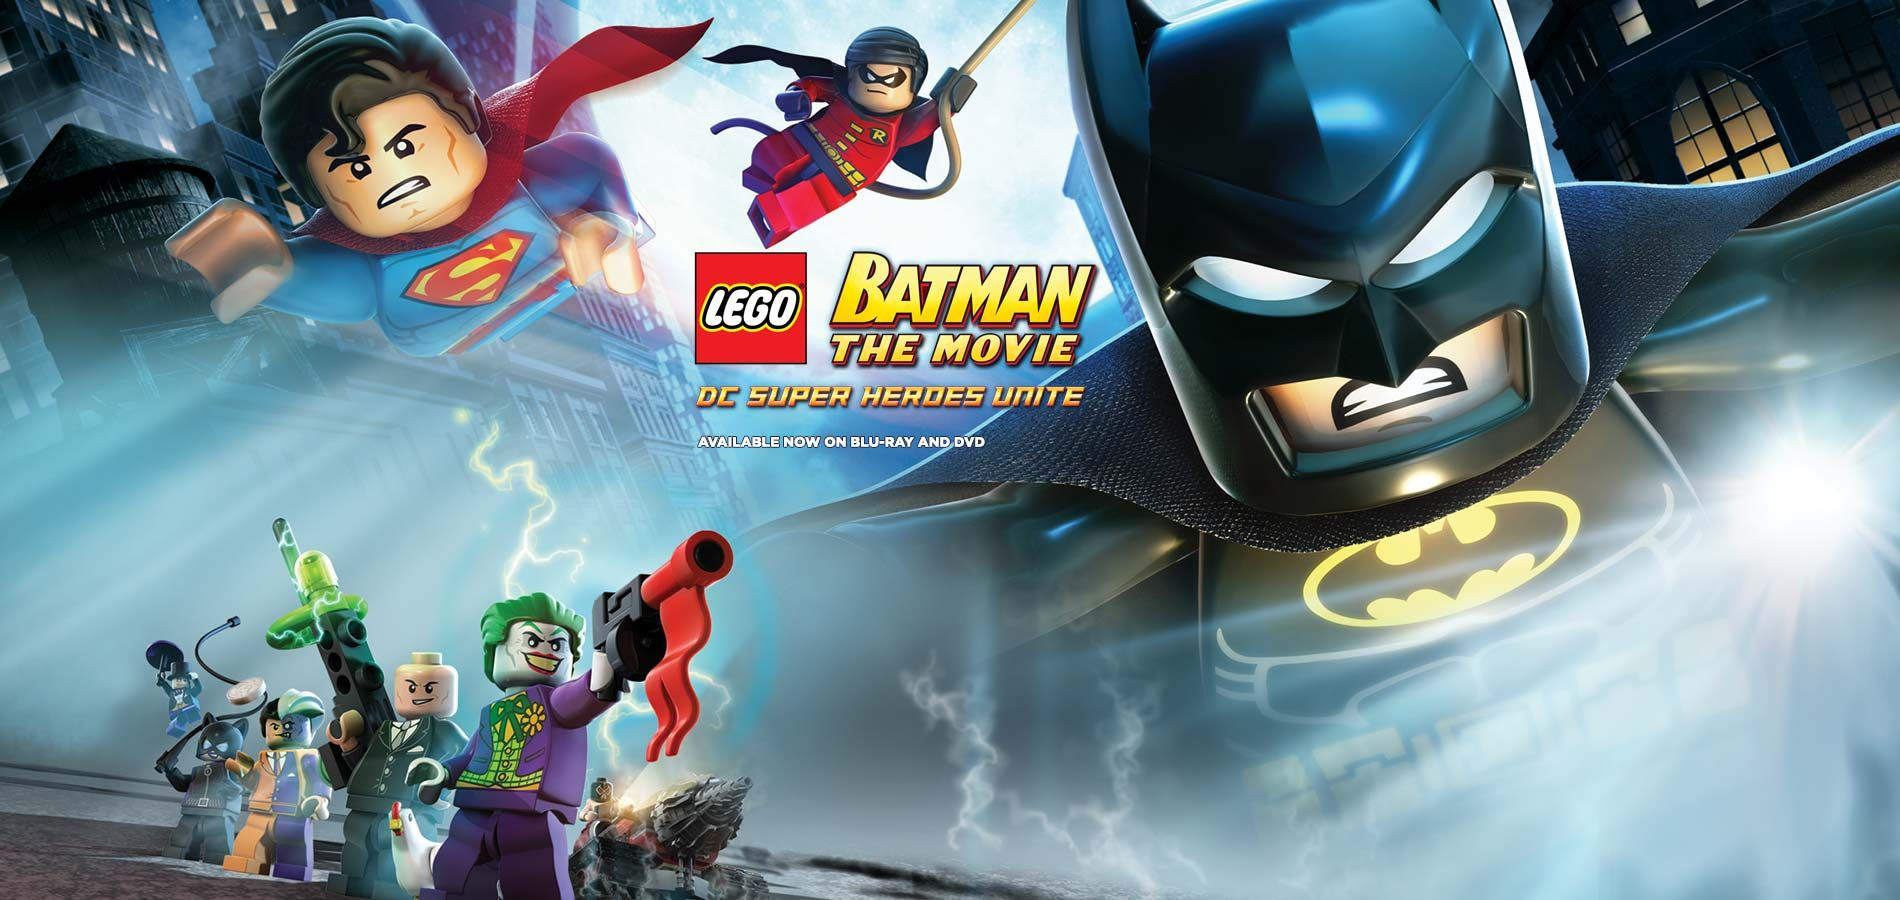 Pin by johneice haney on lego party - Jeux lego batman 2 gratuit ...